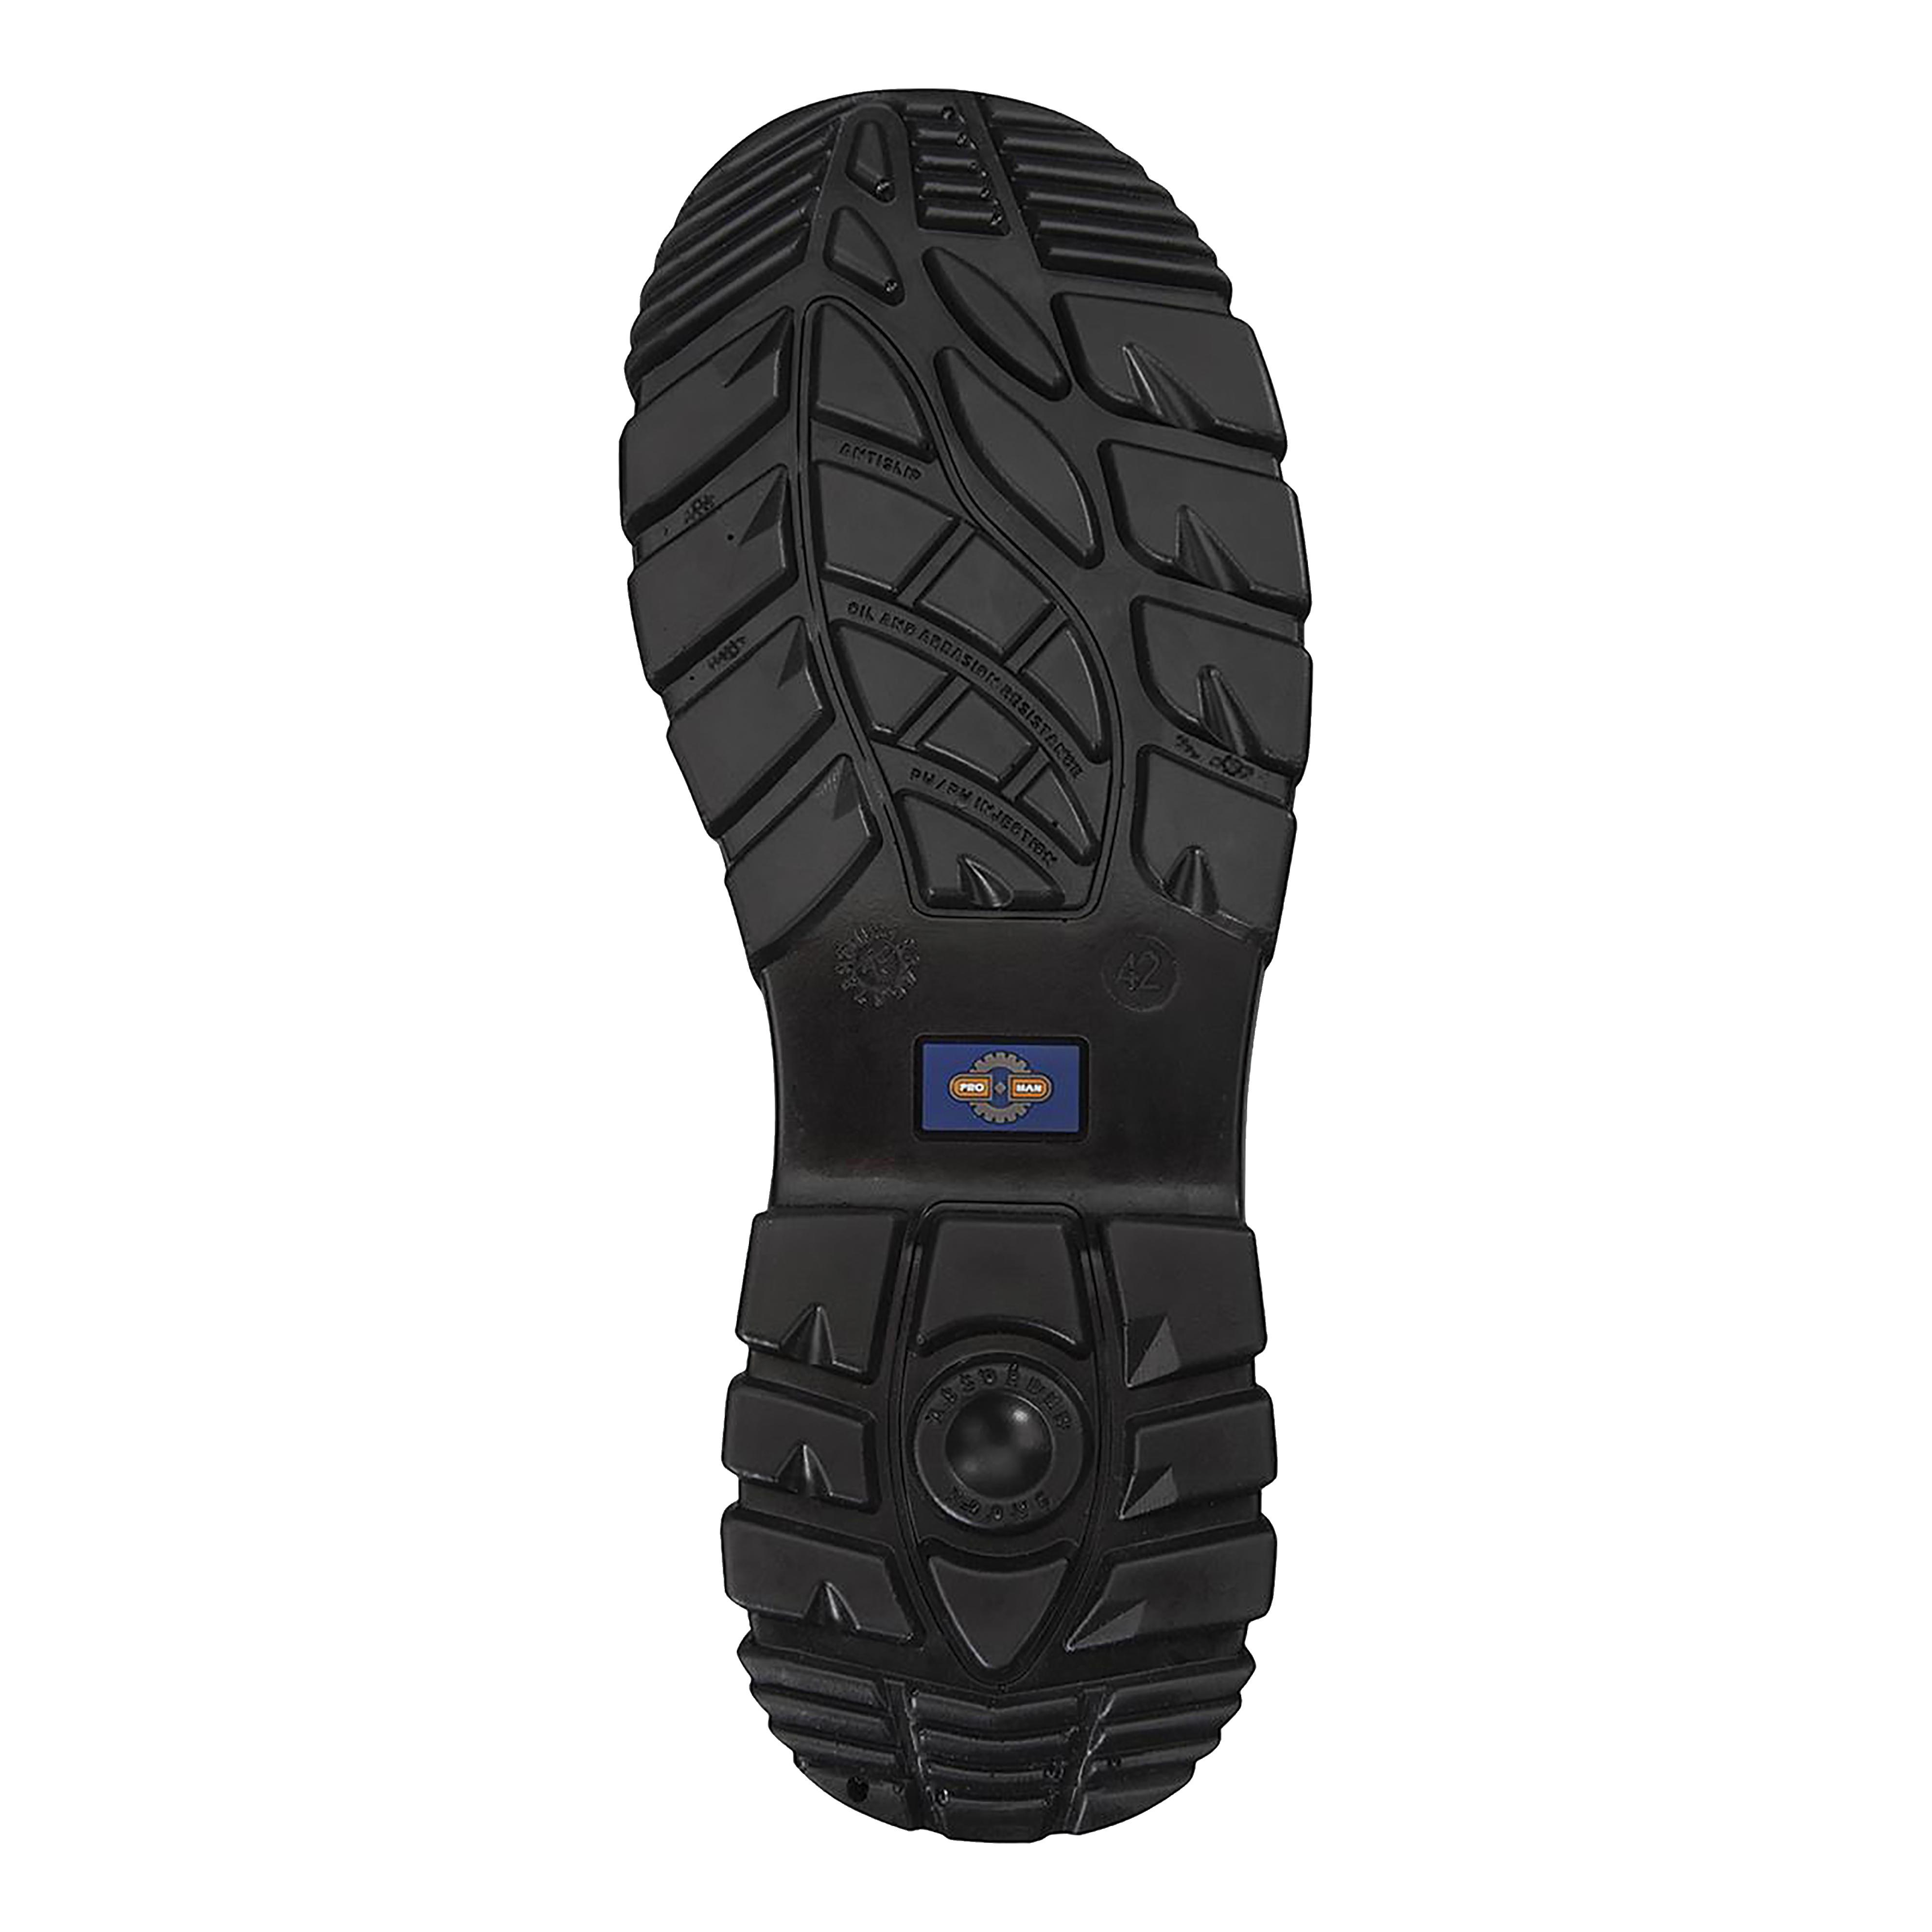 Rockfall ProMan Boot Suede Fibreglass Toecap Black Size 7 Ref PM4020 7